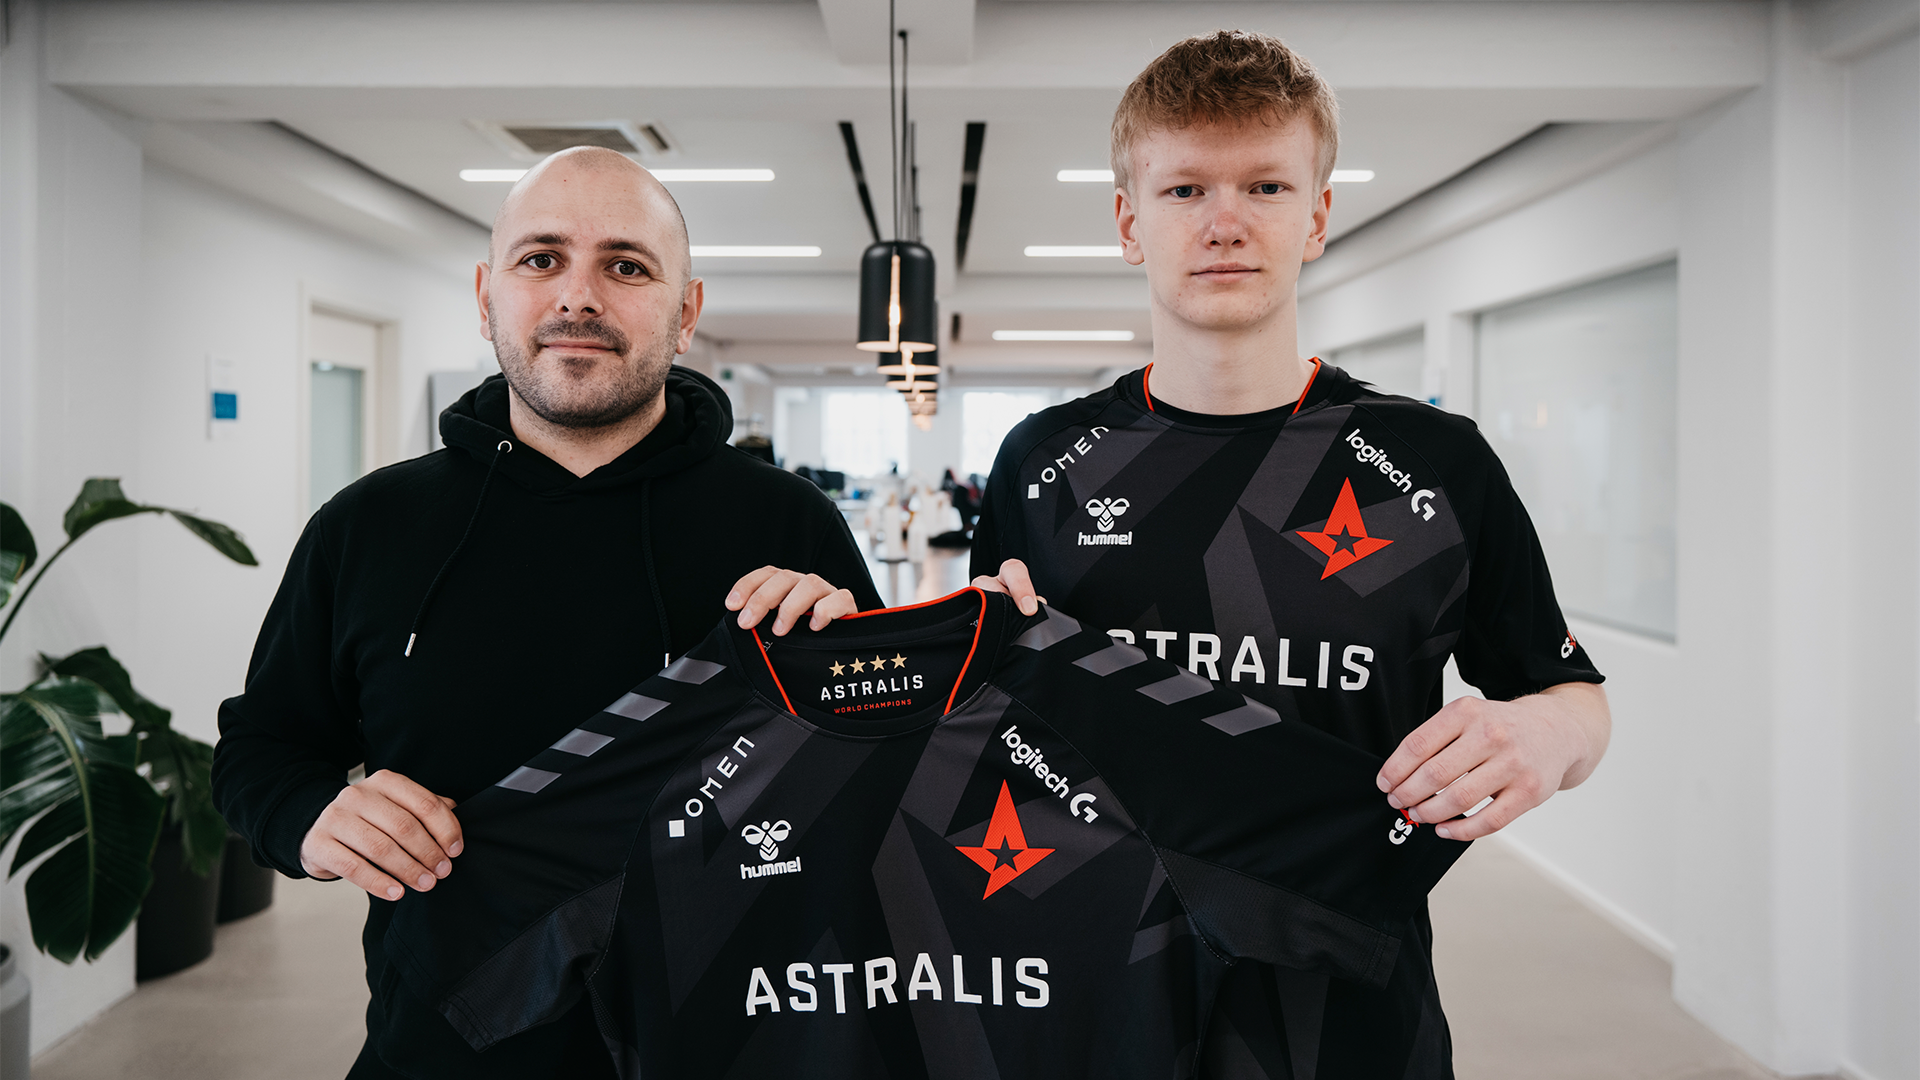 Astralis Talent sign 'Altekz'